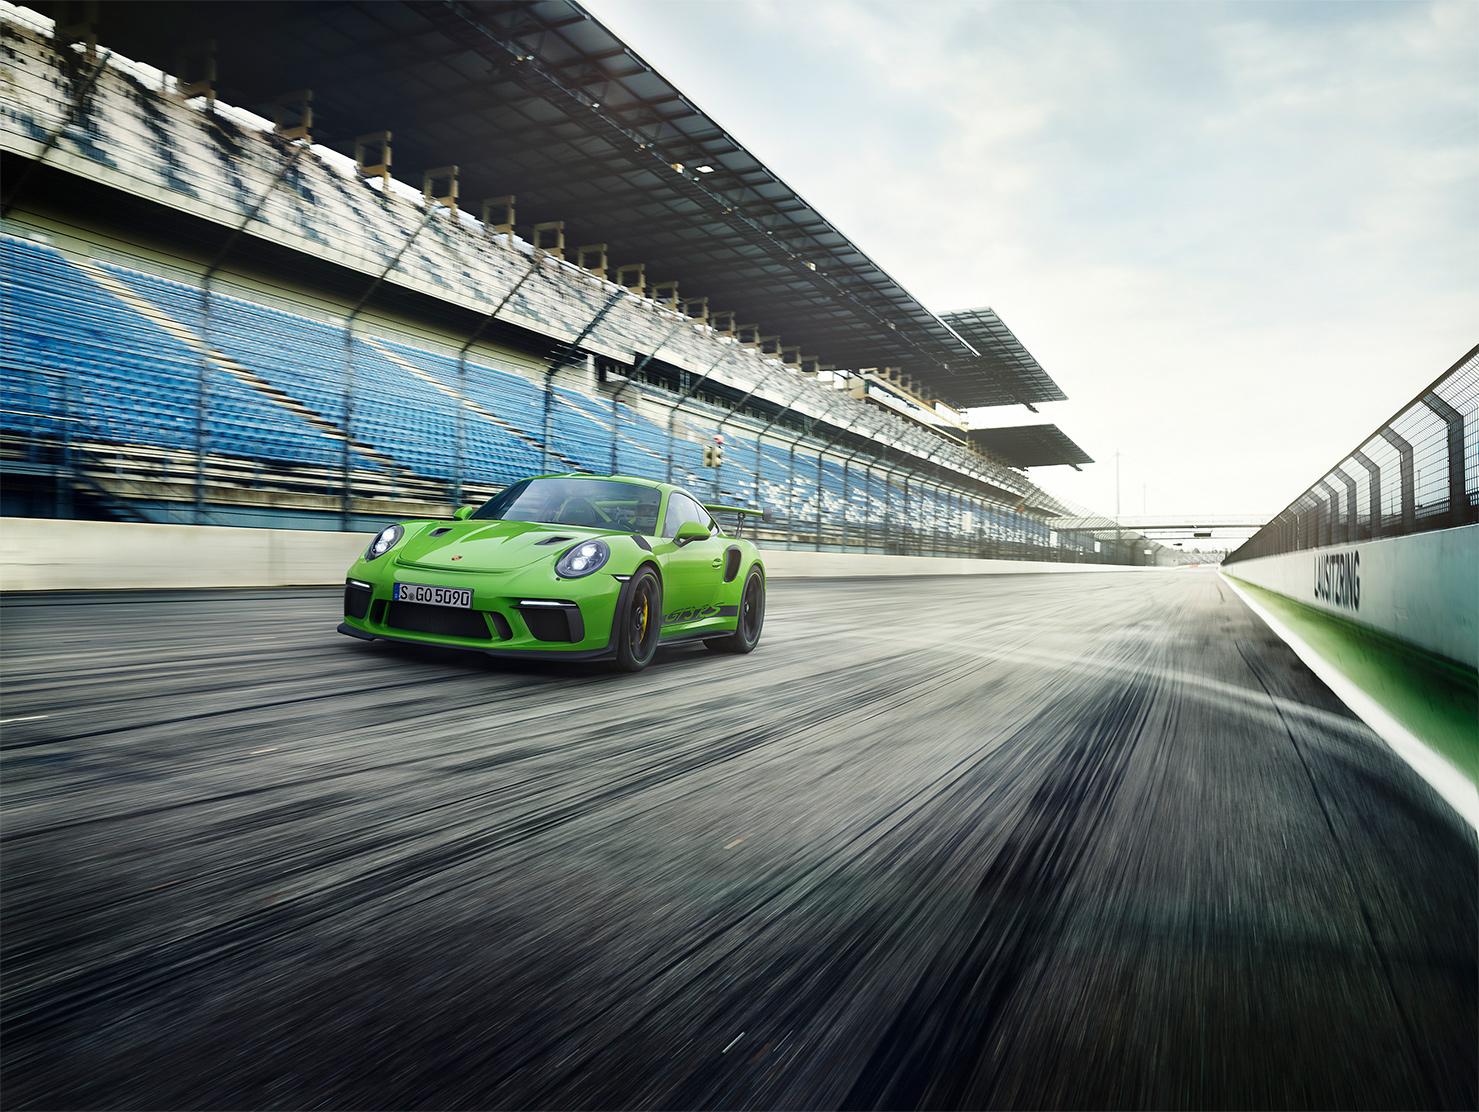 TrackWorthy - 2019 Porsche 911 GT3 RS (6)